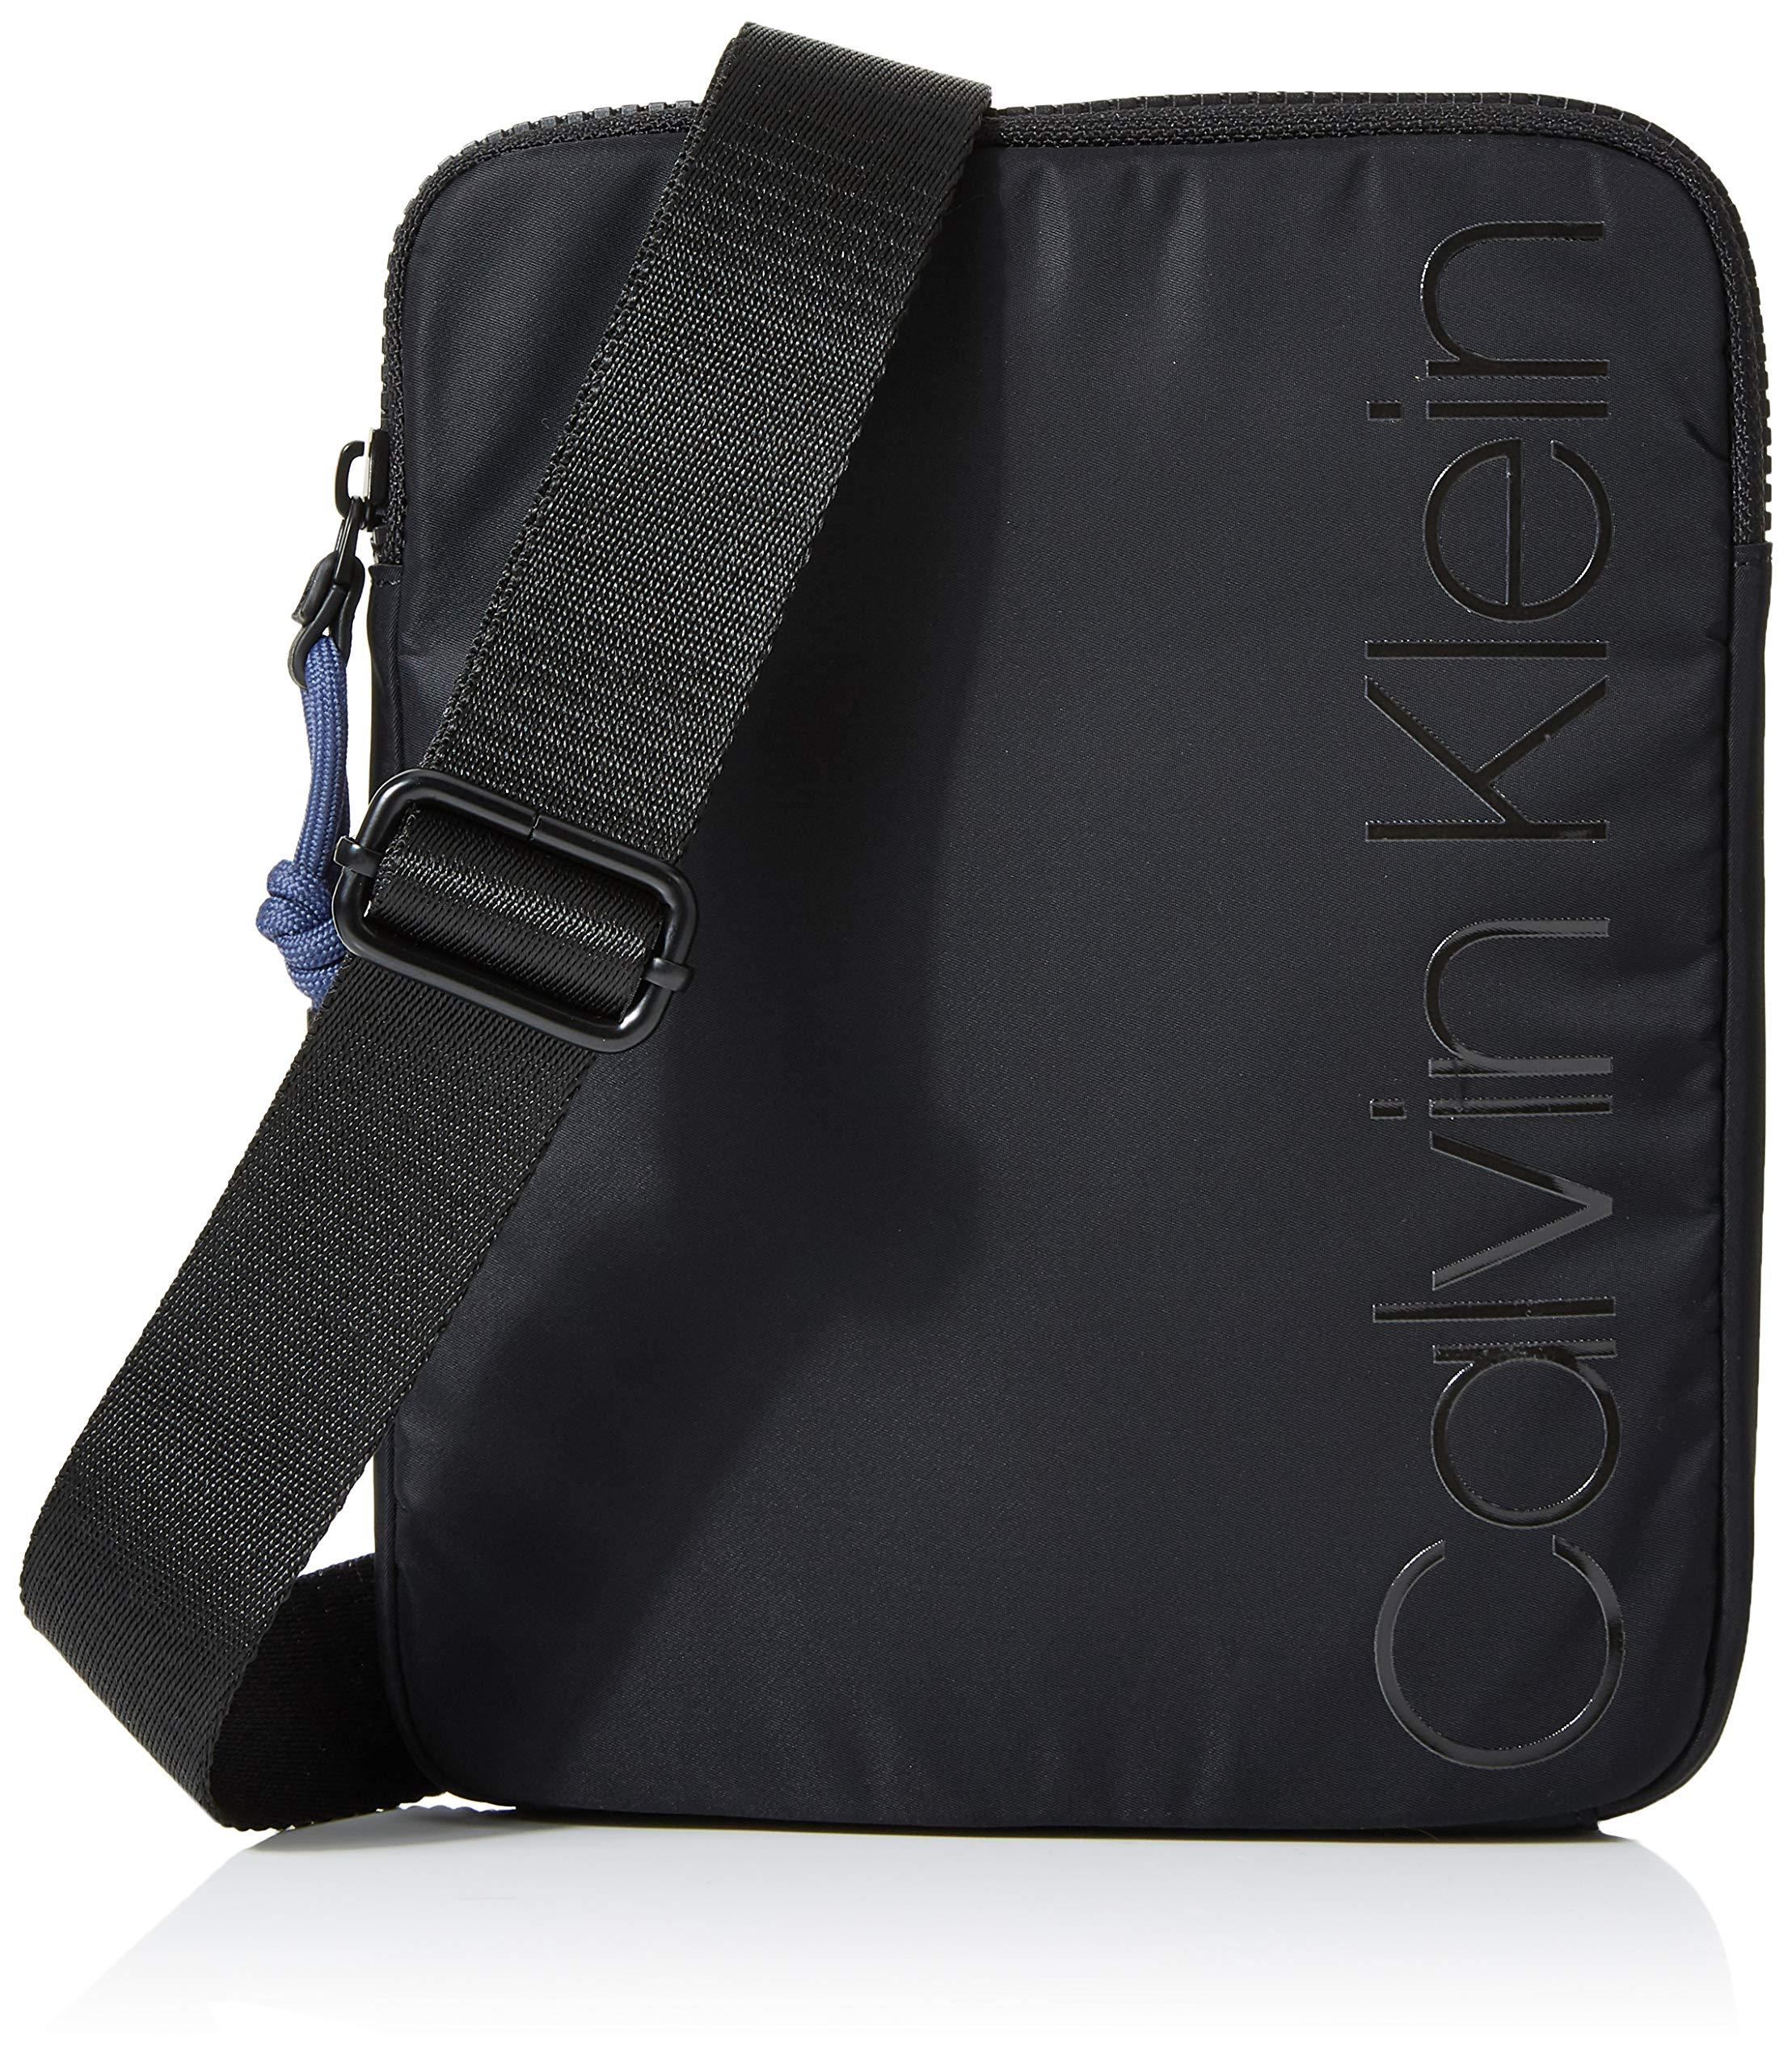 Calvin Klein Trail Flat Crossover, Men's Bag Organiser, Black, 1x1x1 cm (W x H L)